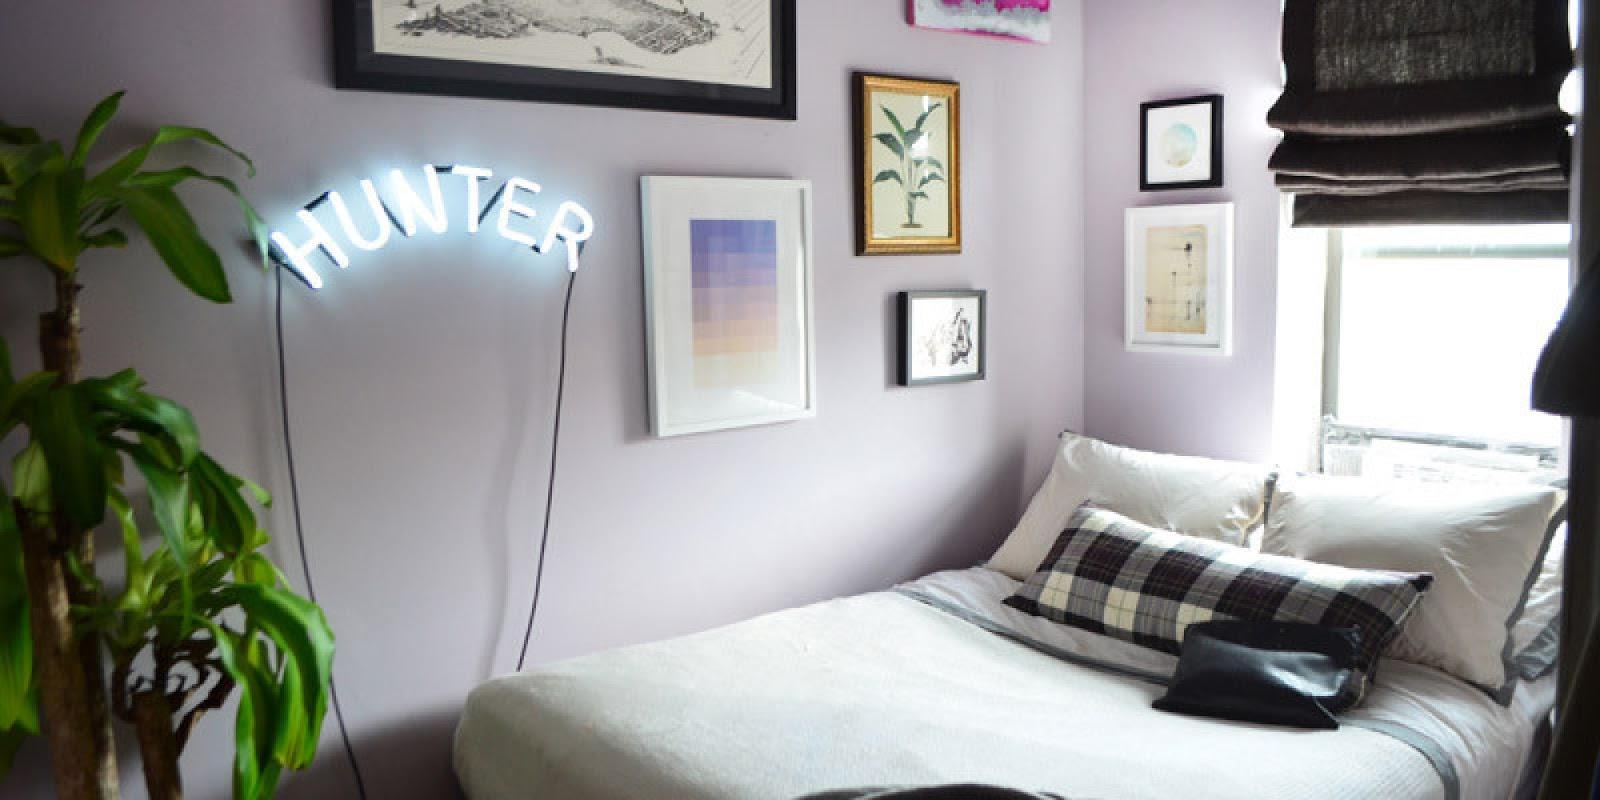 60 Desain Interior Kamar Tidur Ukuran 2 3 Meter Minimalis Perhimpunan Penghuni Green T Residence 2